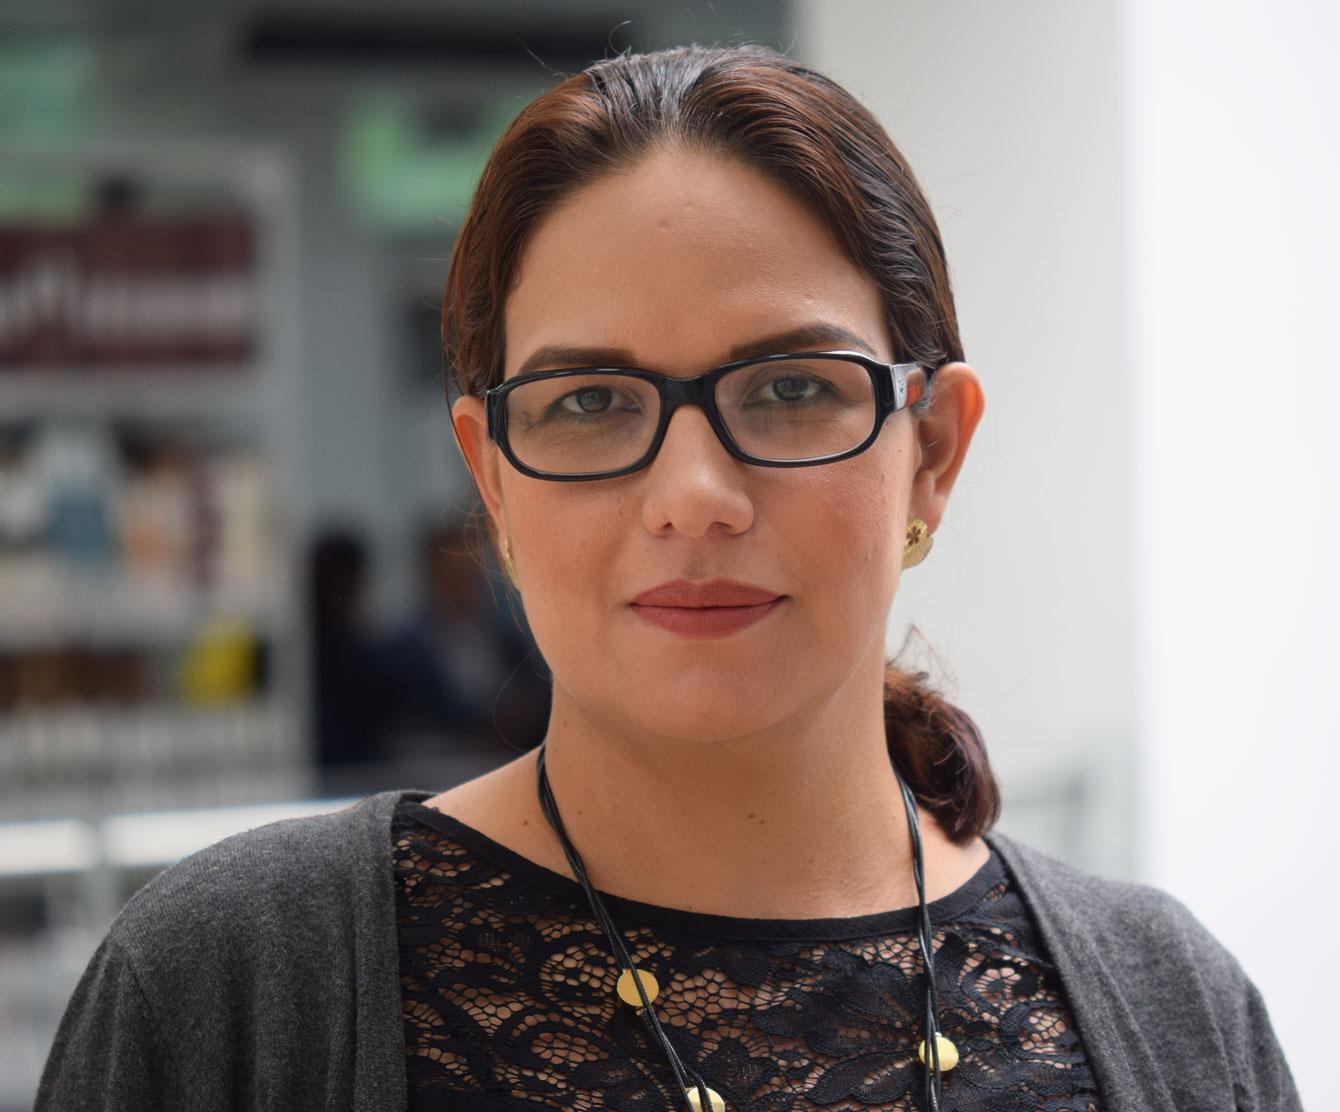 Evelin Arteaga Arcentales